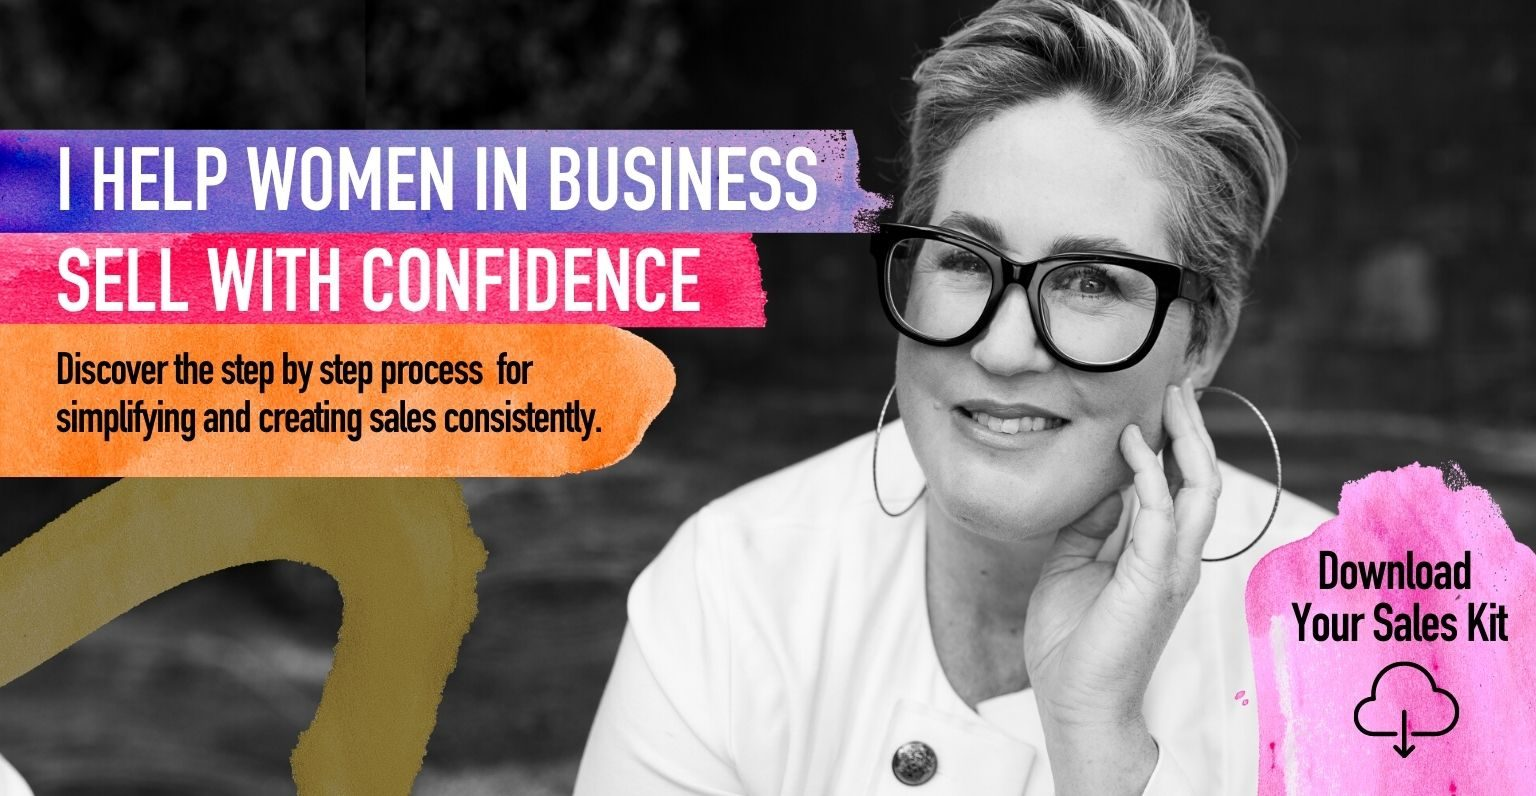 women in business - Natalie Tolhopf